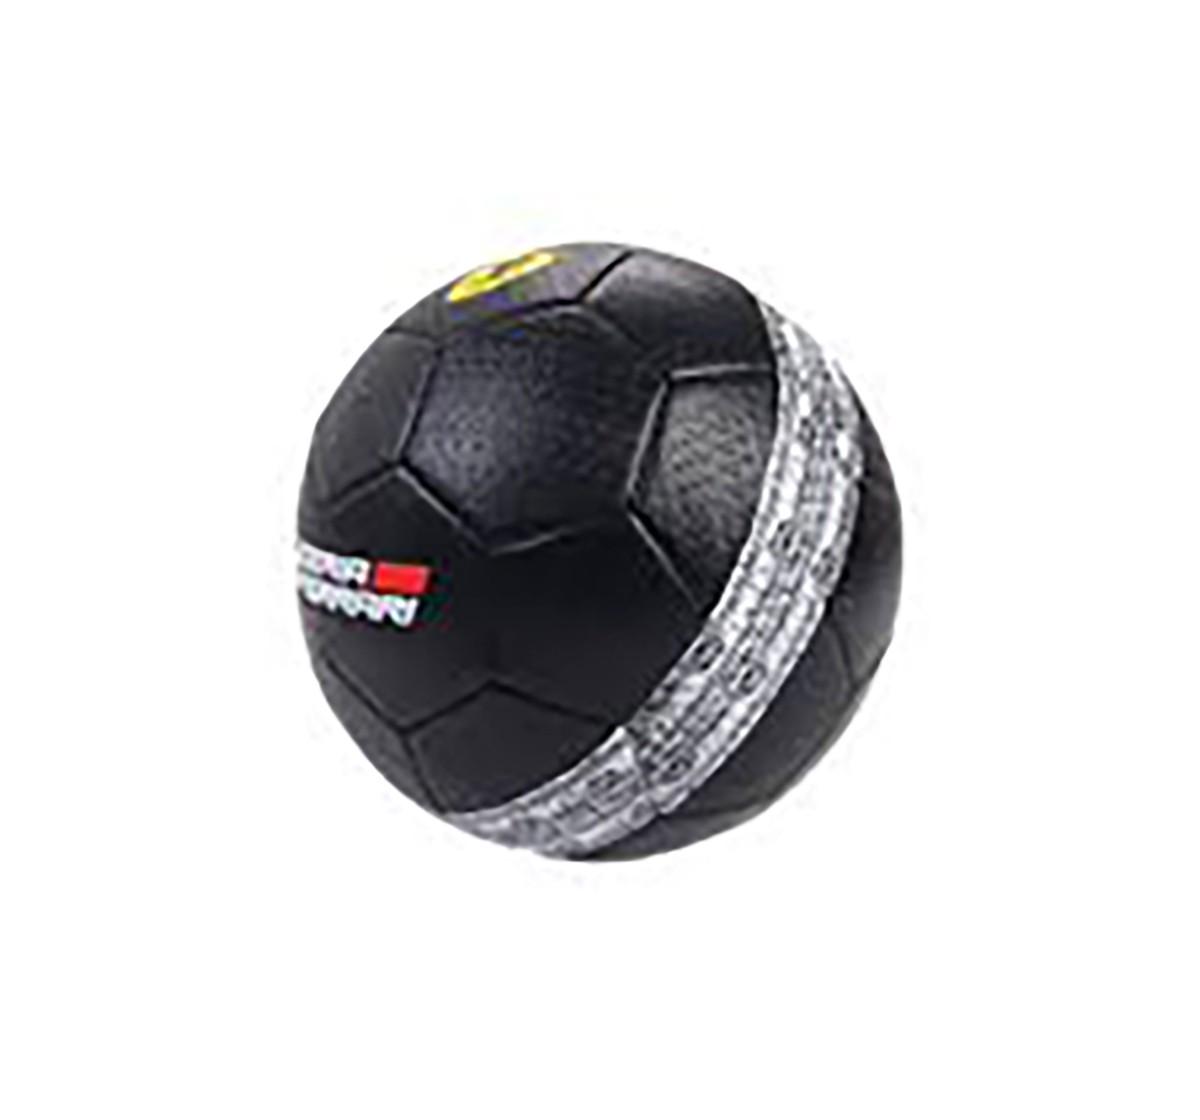 Ferrari Football Size 5 Pvc, Sports & Accessories for Kids age 5Y+